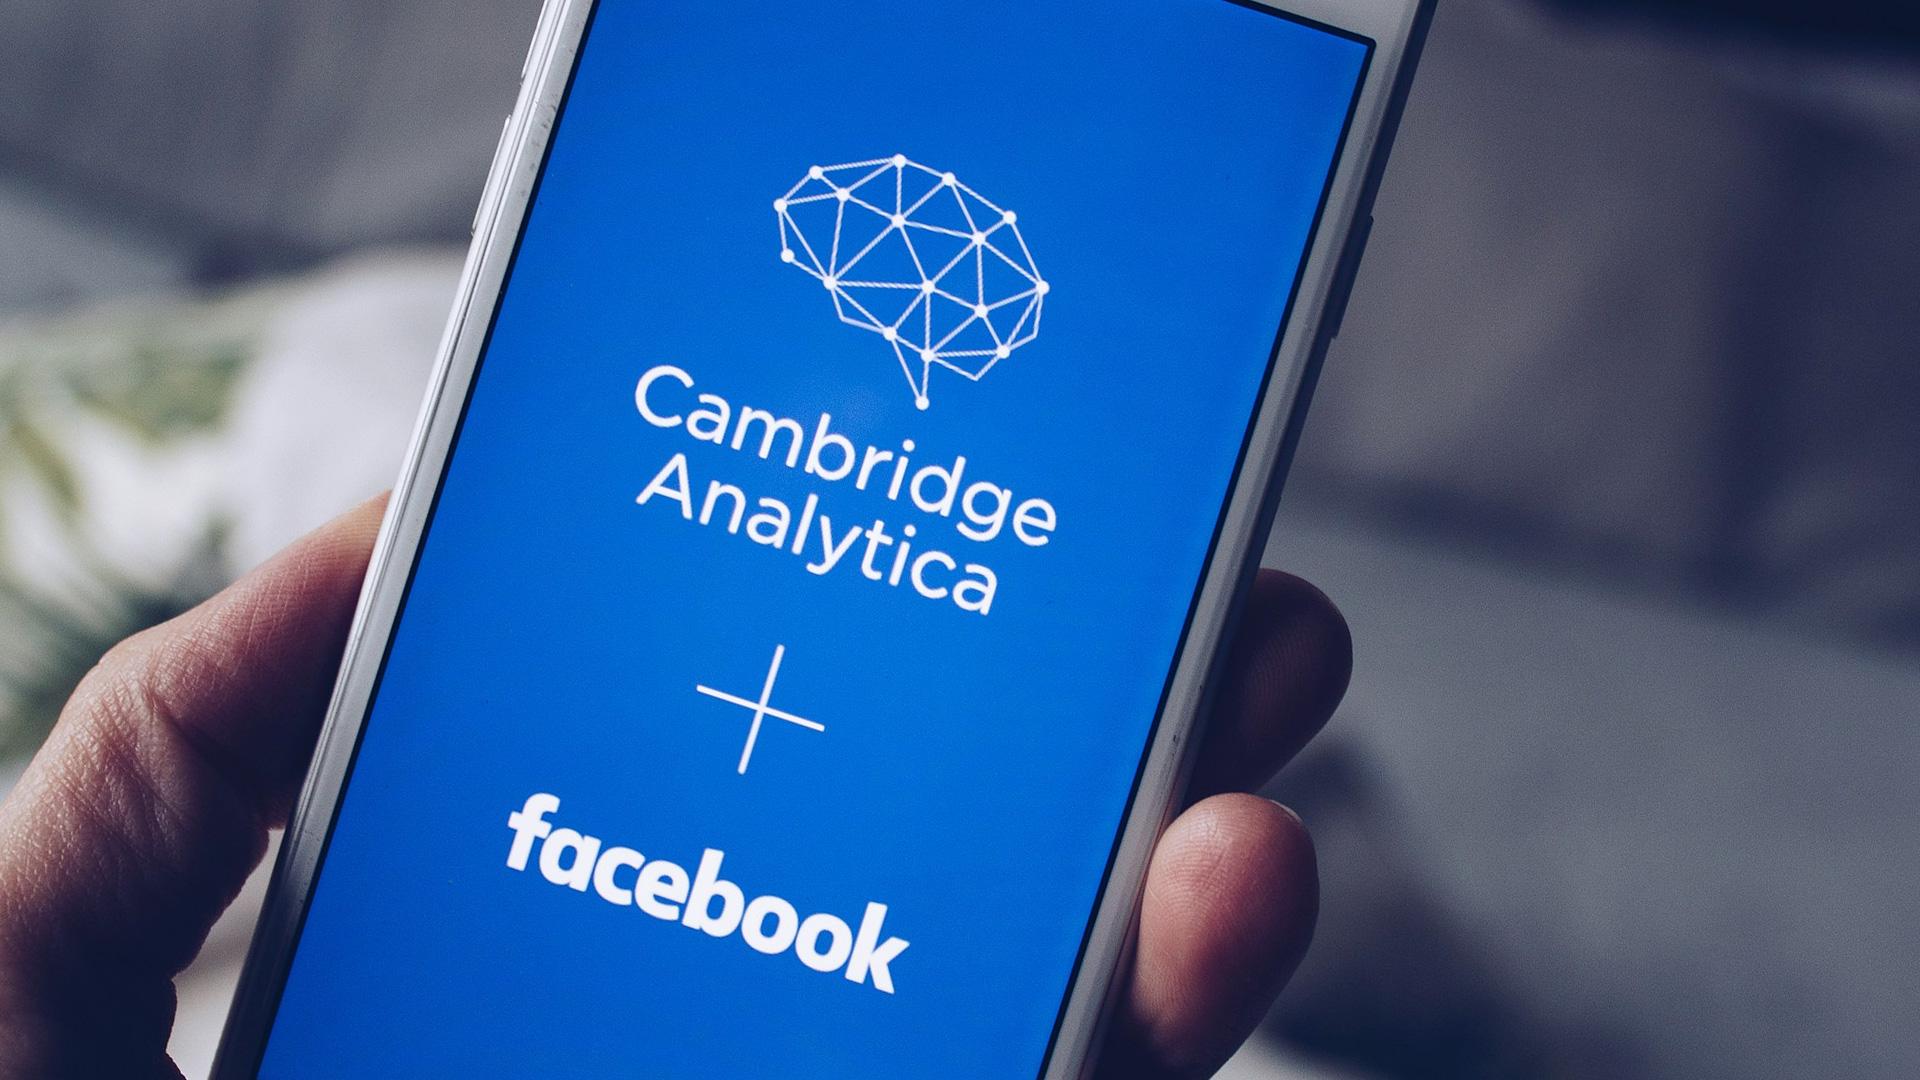 Il caso Facebook-Cambridge Analytica: cosa diavolo sta accadendo?